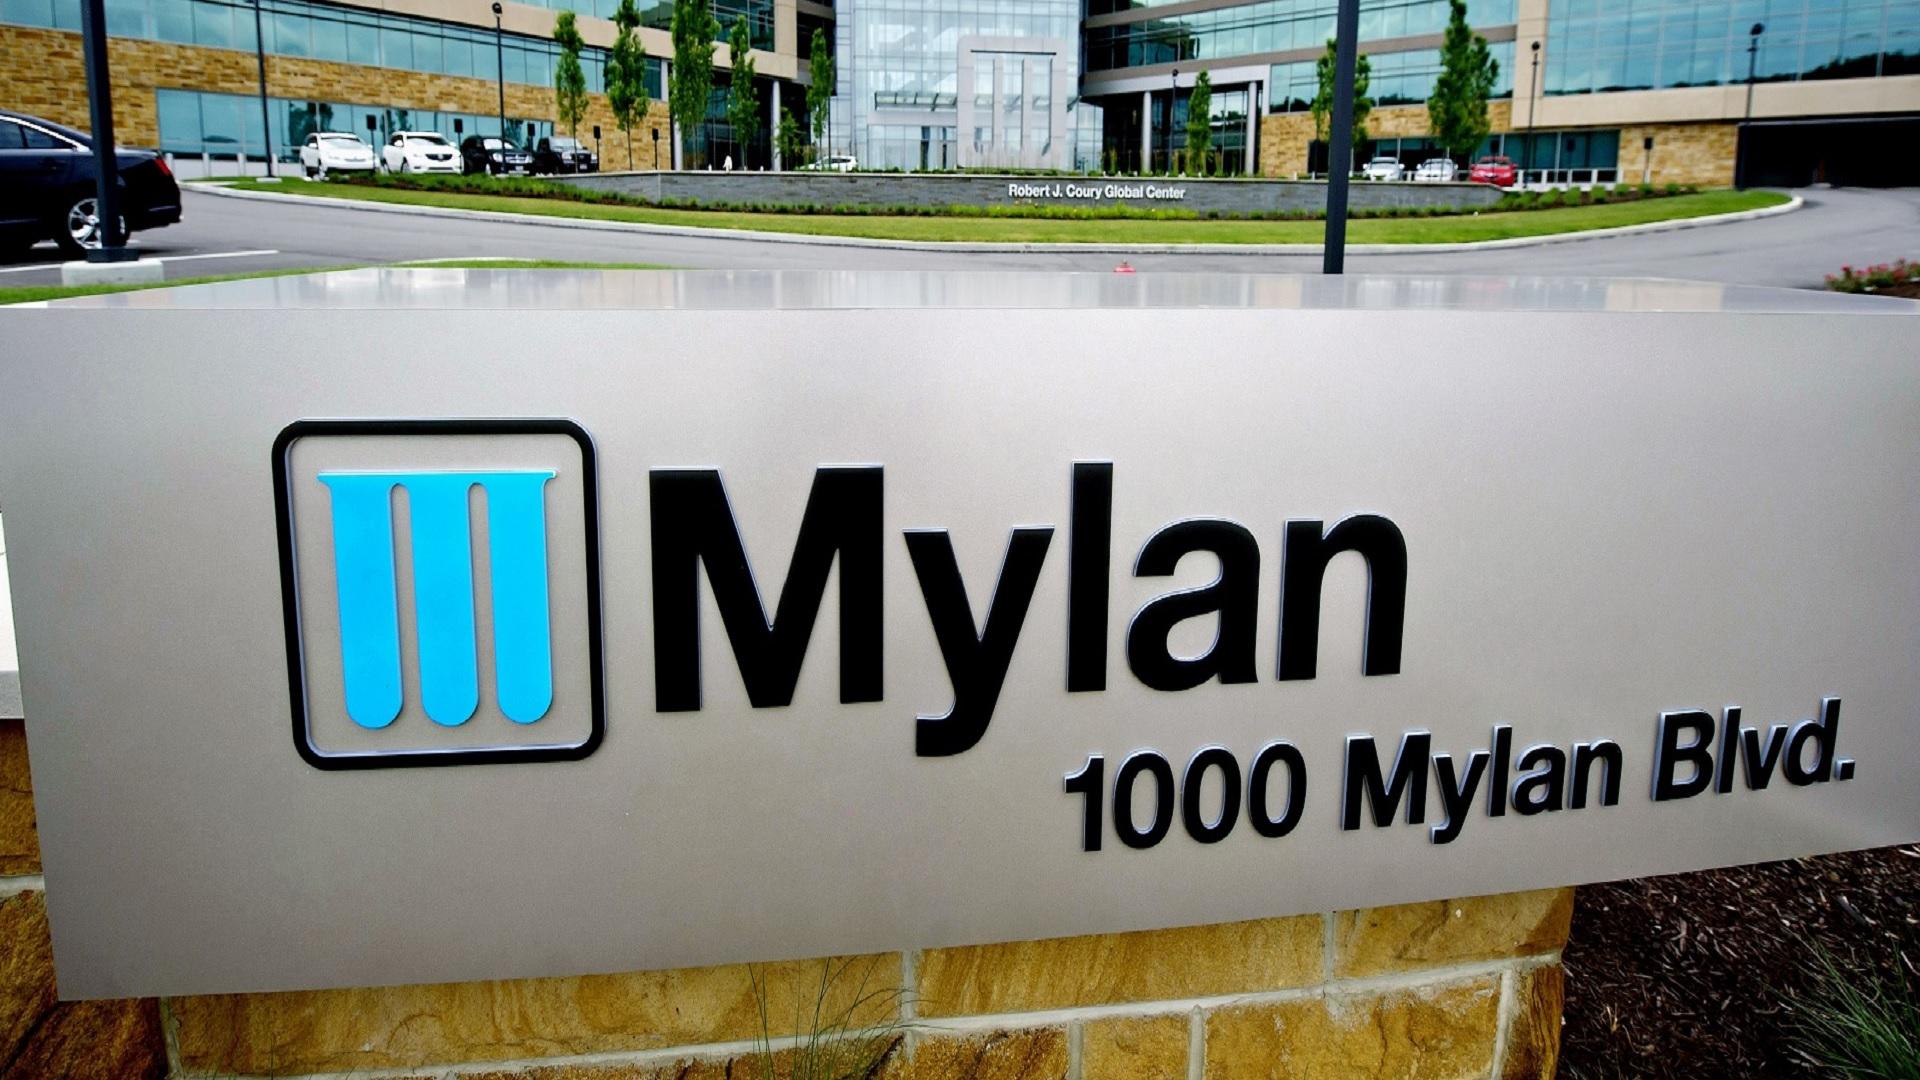 Mylan φαρμακευτική: Εξαγοράζει την Aspen και αποκτά το χαρτοφυλάκιο θρόμβωσης στην Ευρώπη